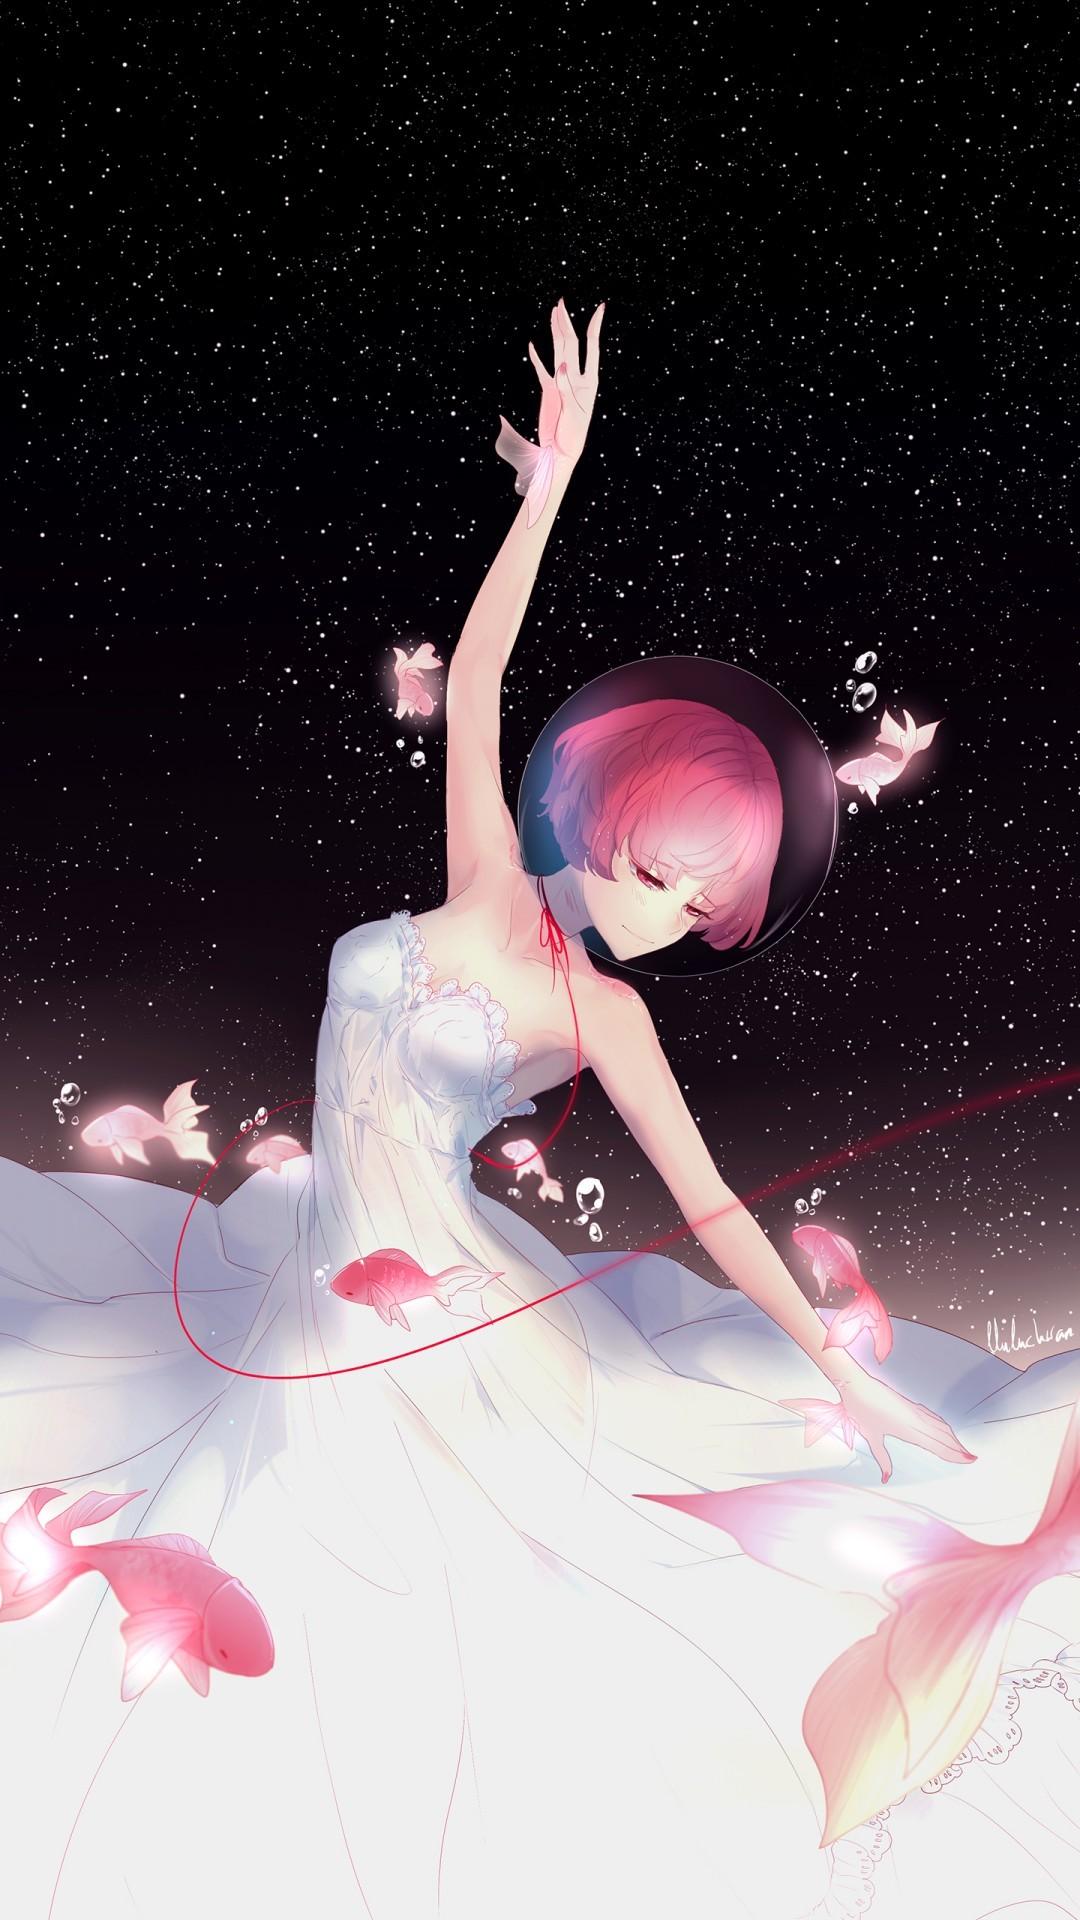 Free Anime girl Night Dance phone wallpaper by alejandro2